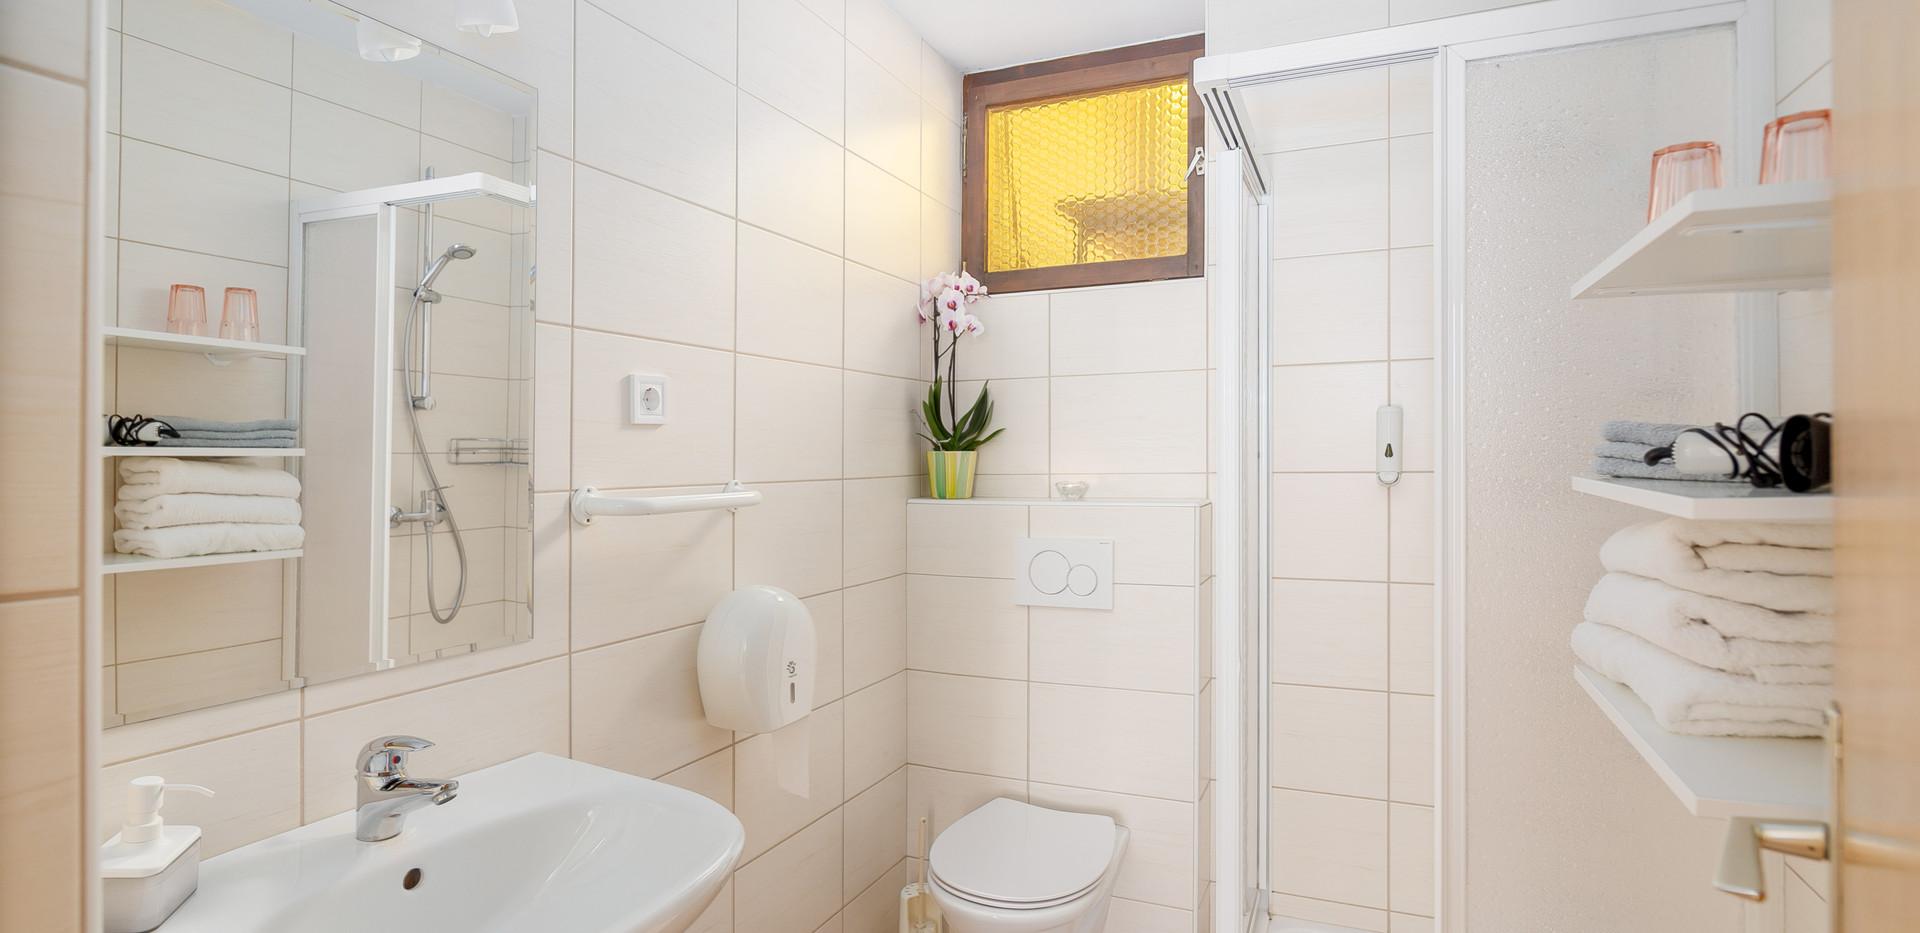 B-202-bathroom_2050.jpg